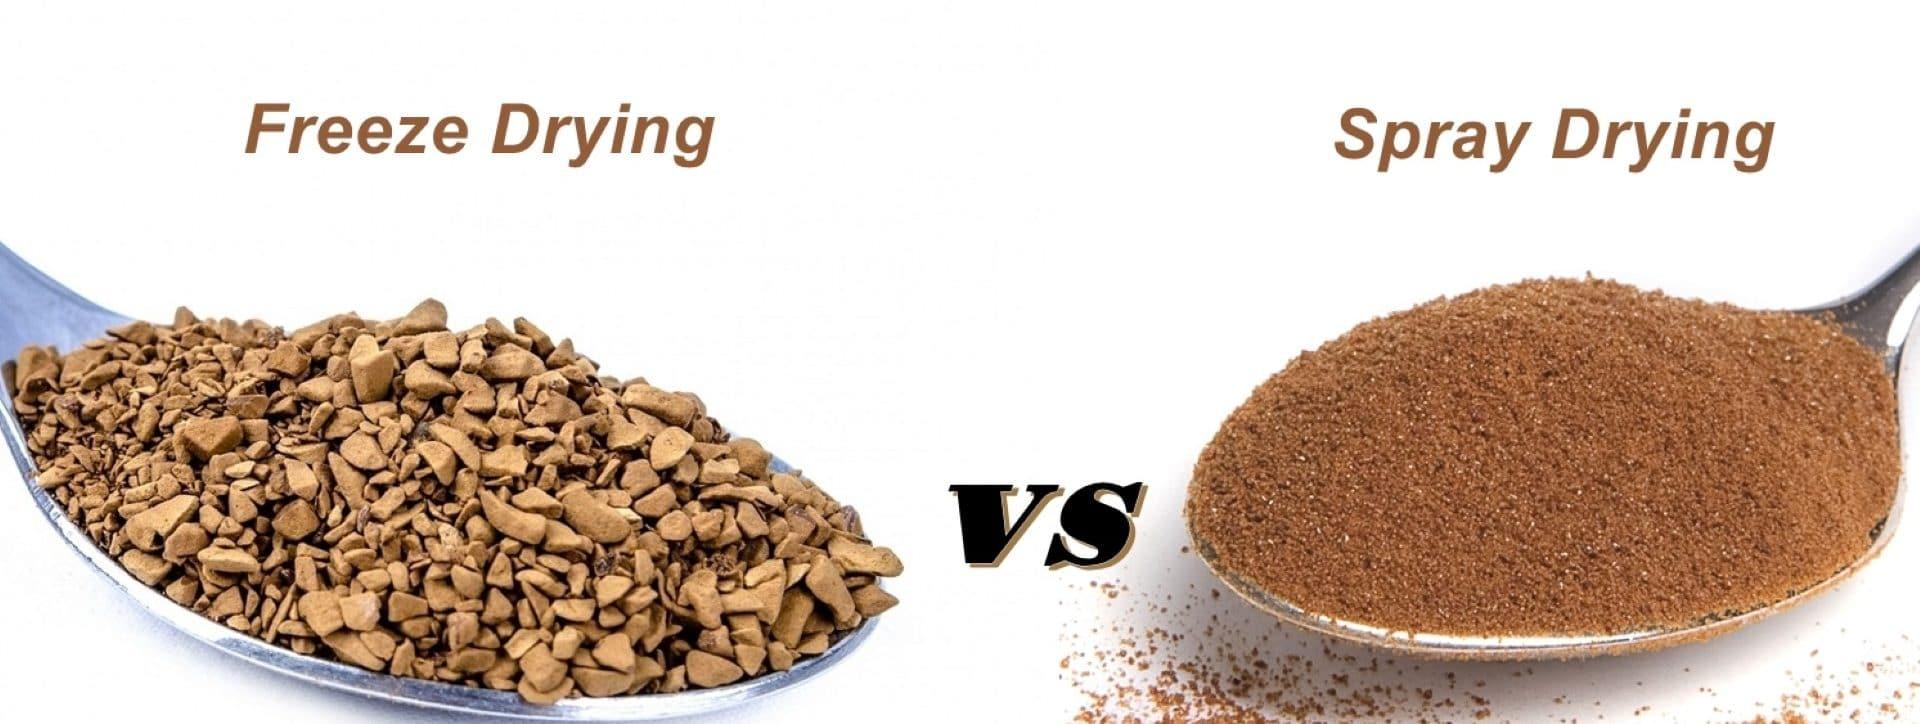 Spray Drying vs Freeze Drying